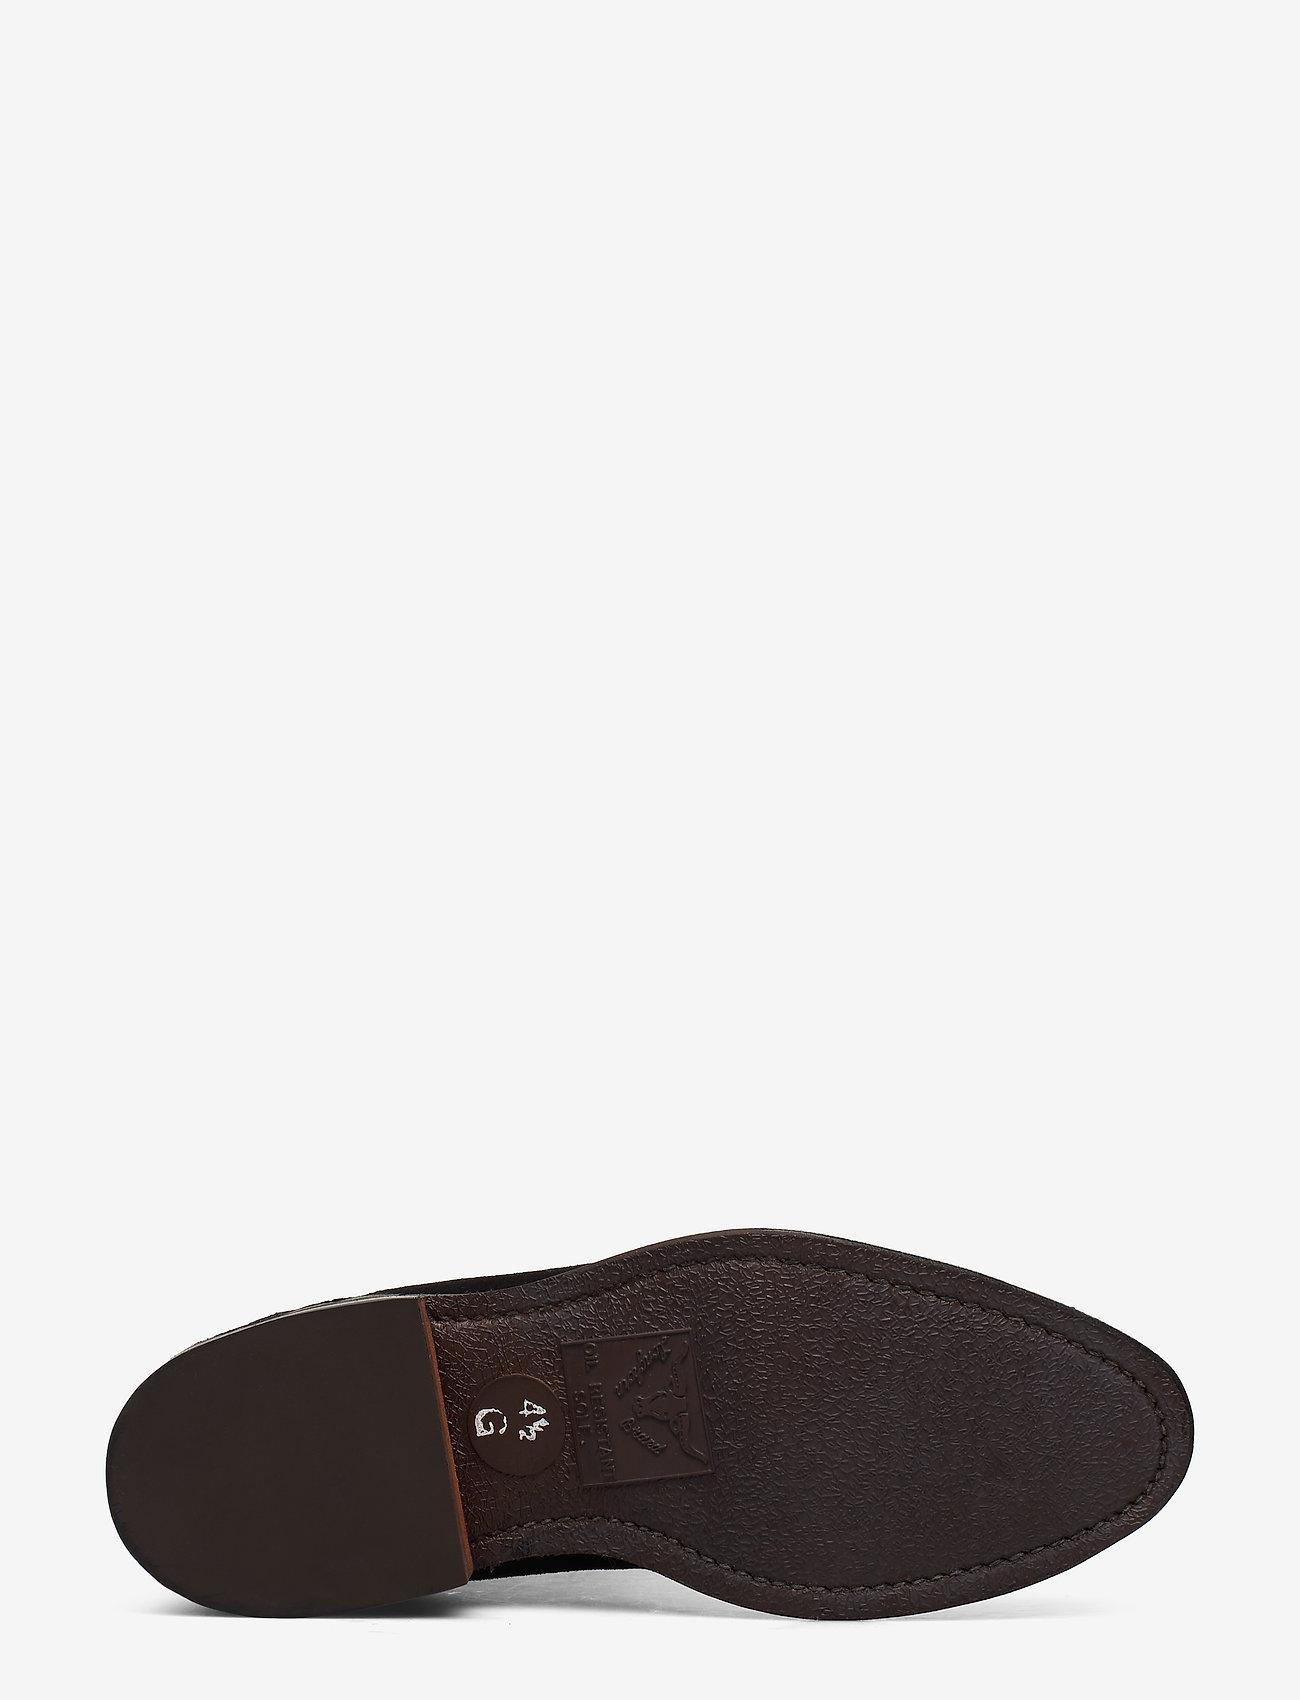 R.M. Williams Macquaire G - Stiefel BLACK - Schuhe Billige